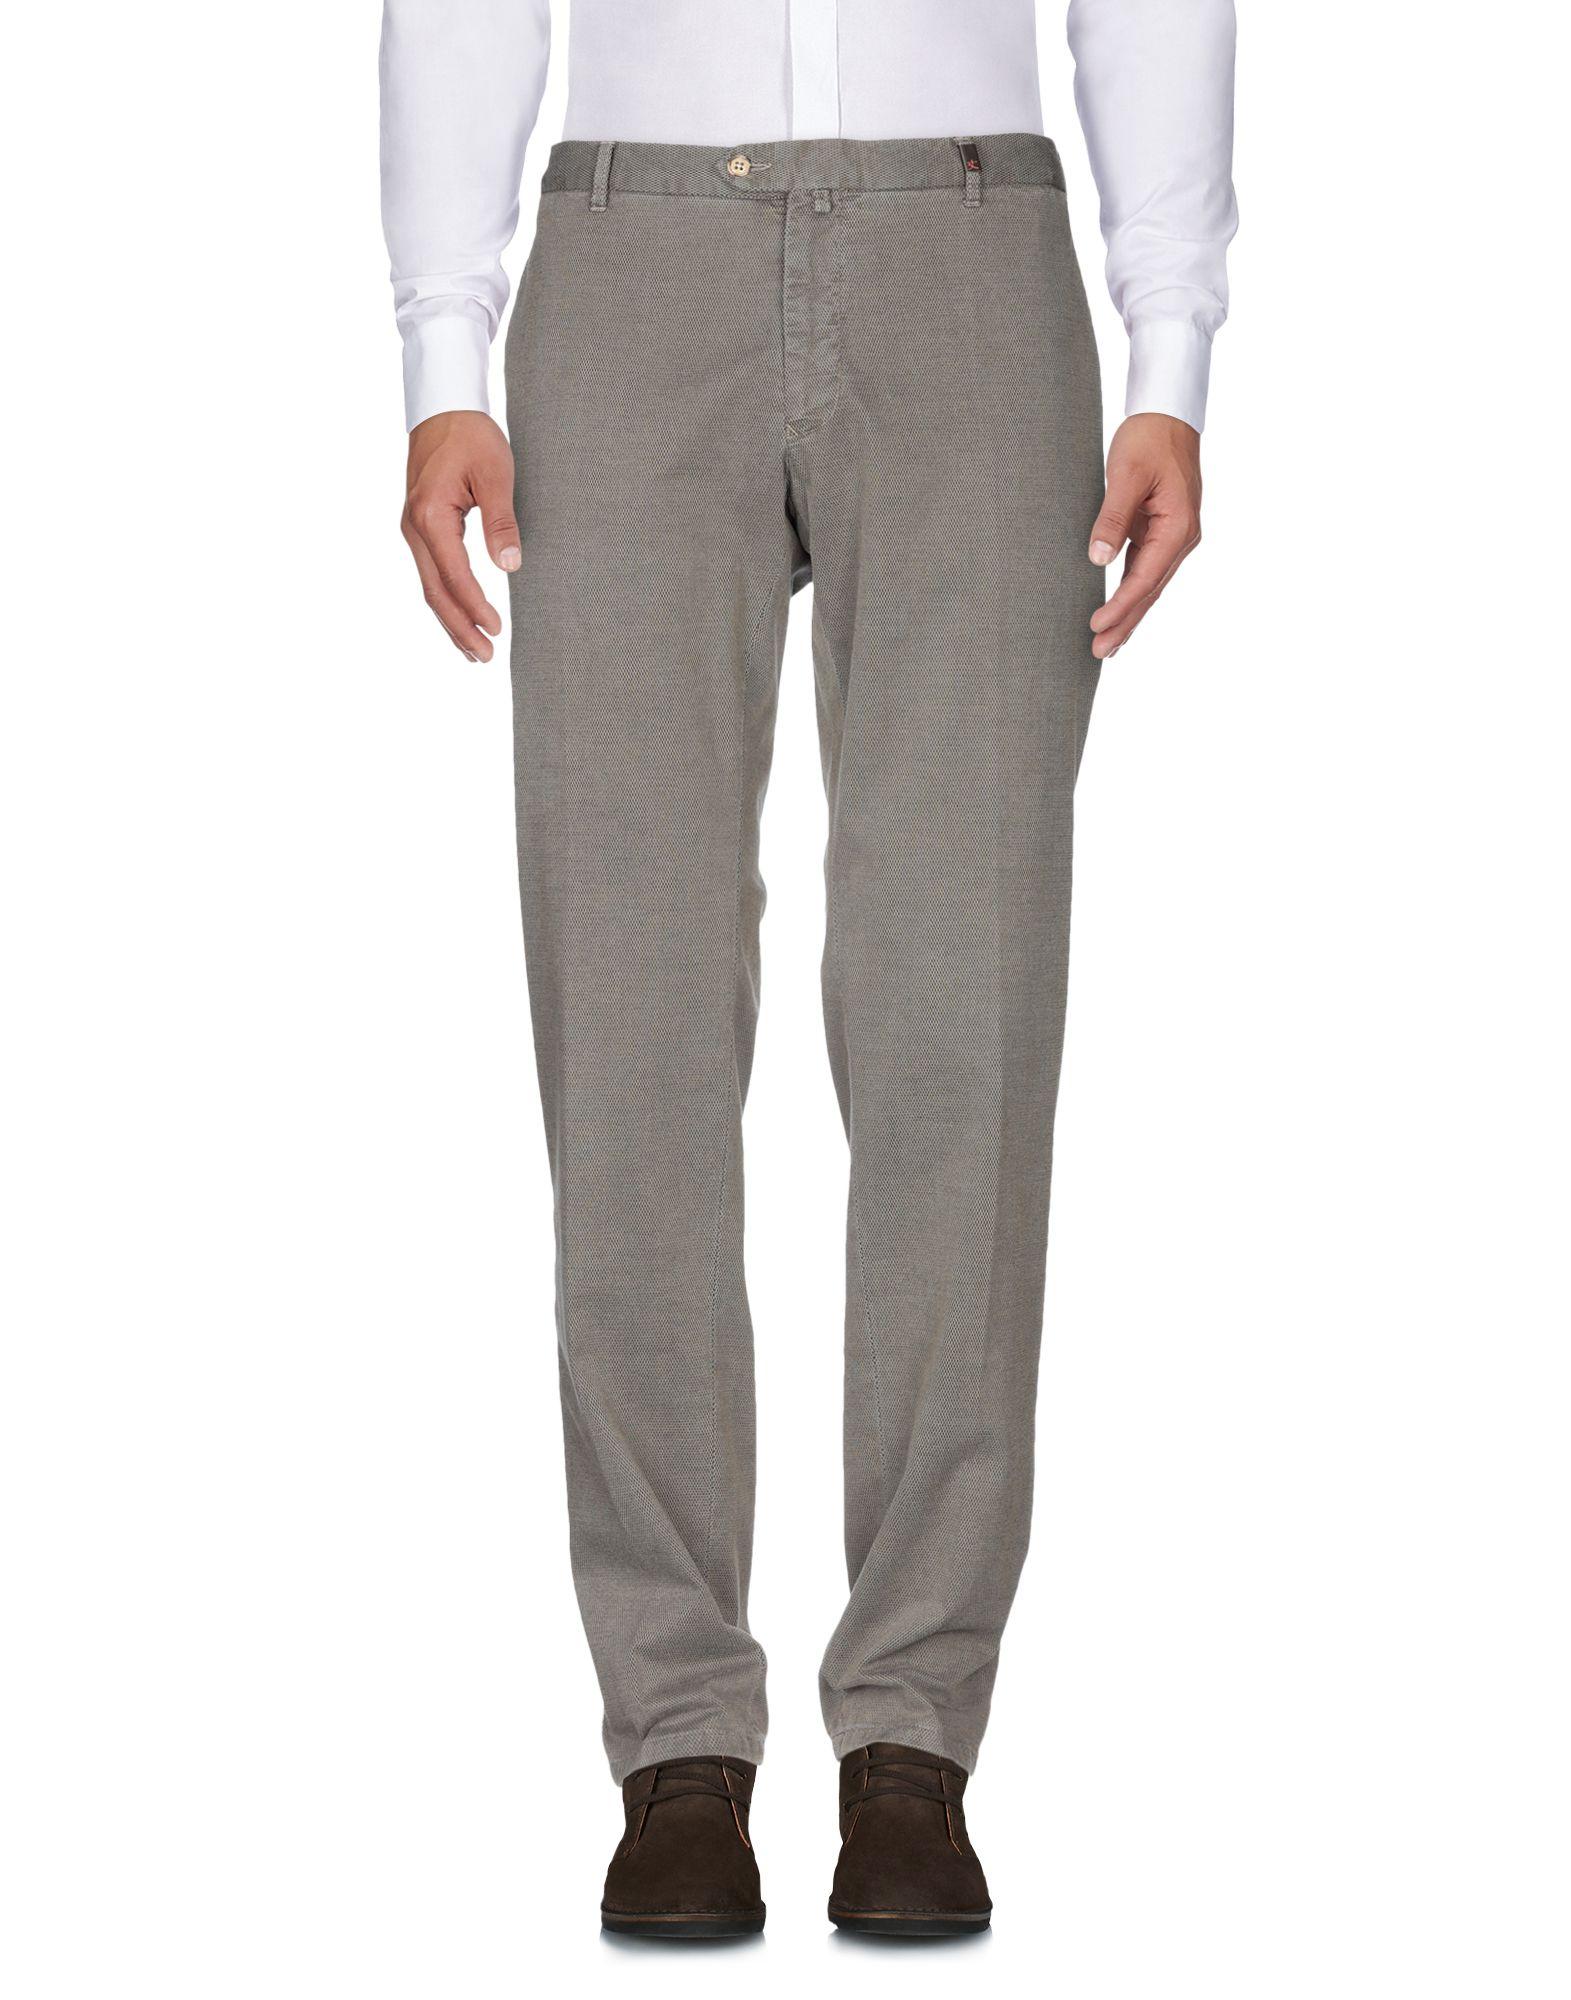 GIO ZUBON | GIO ZUBON Casual pants 13219721 | Goxip